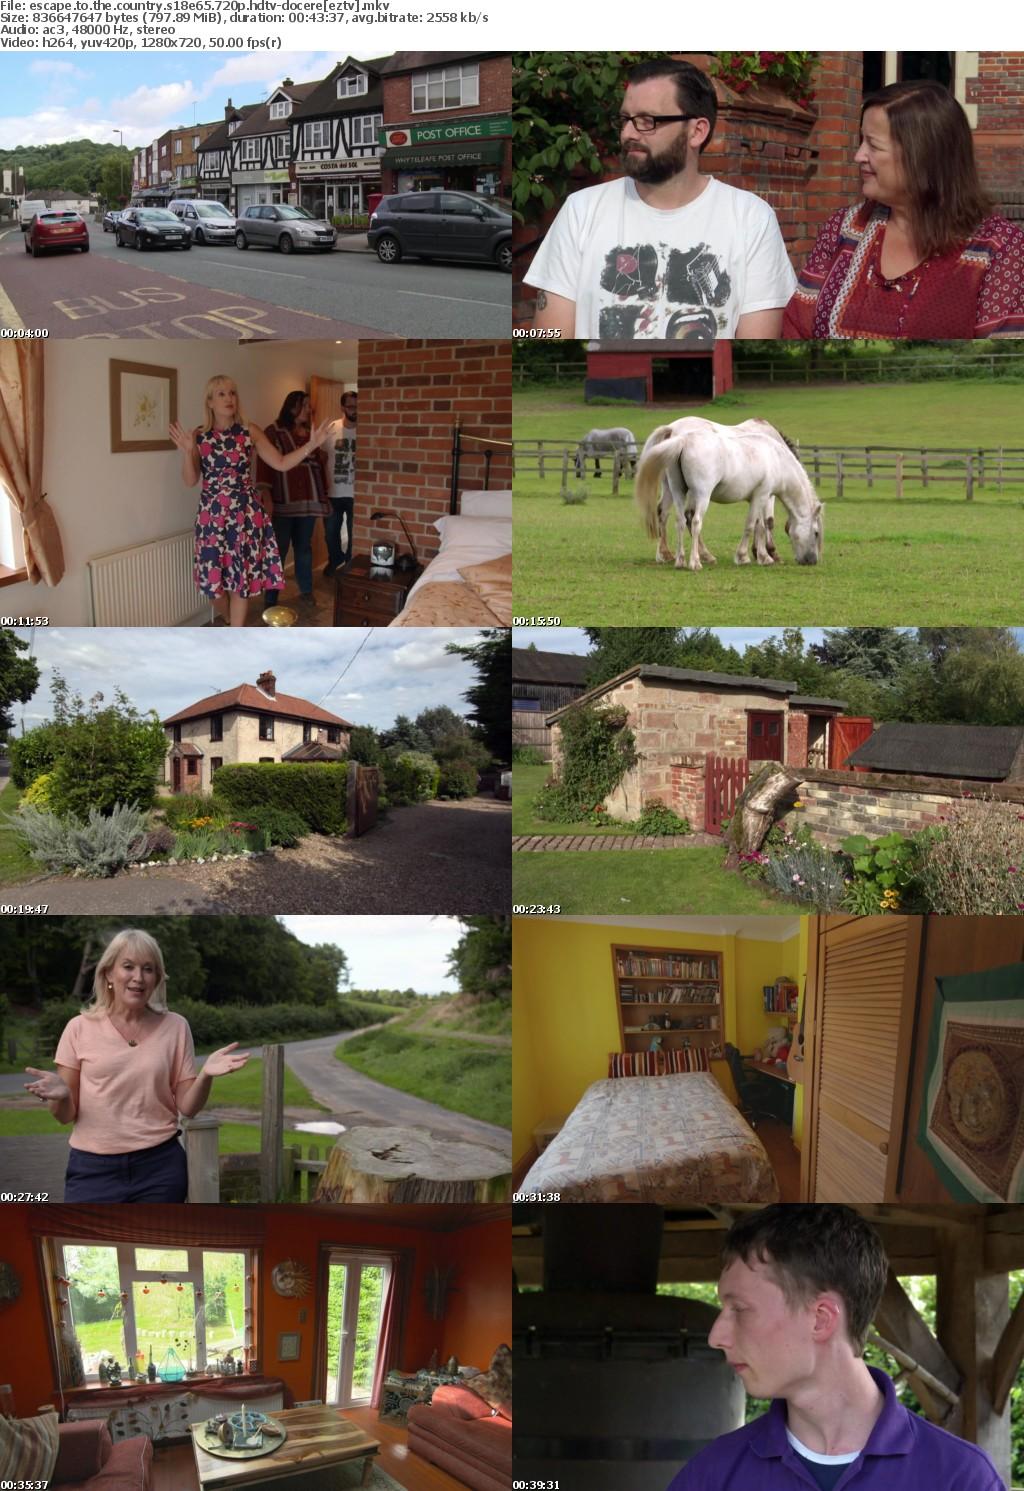 Escape to the Country S18E65 720p HDTV x264-DOCERE